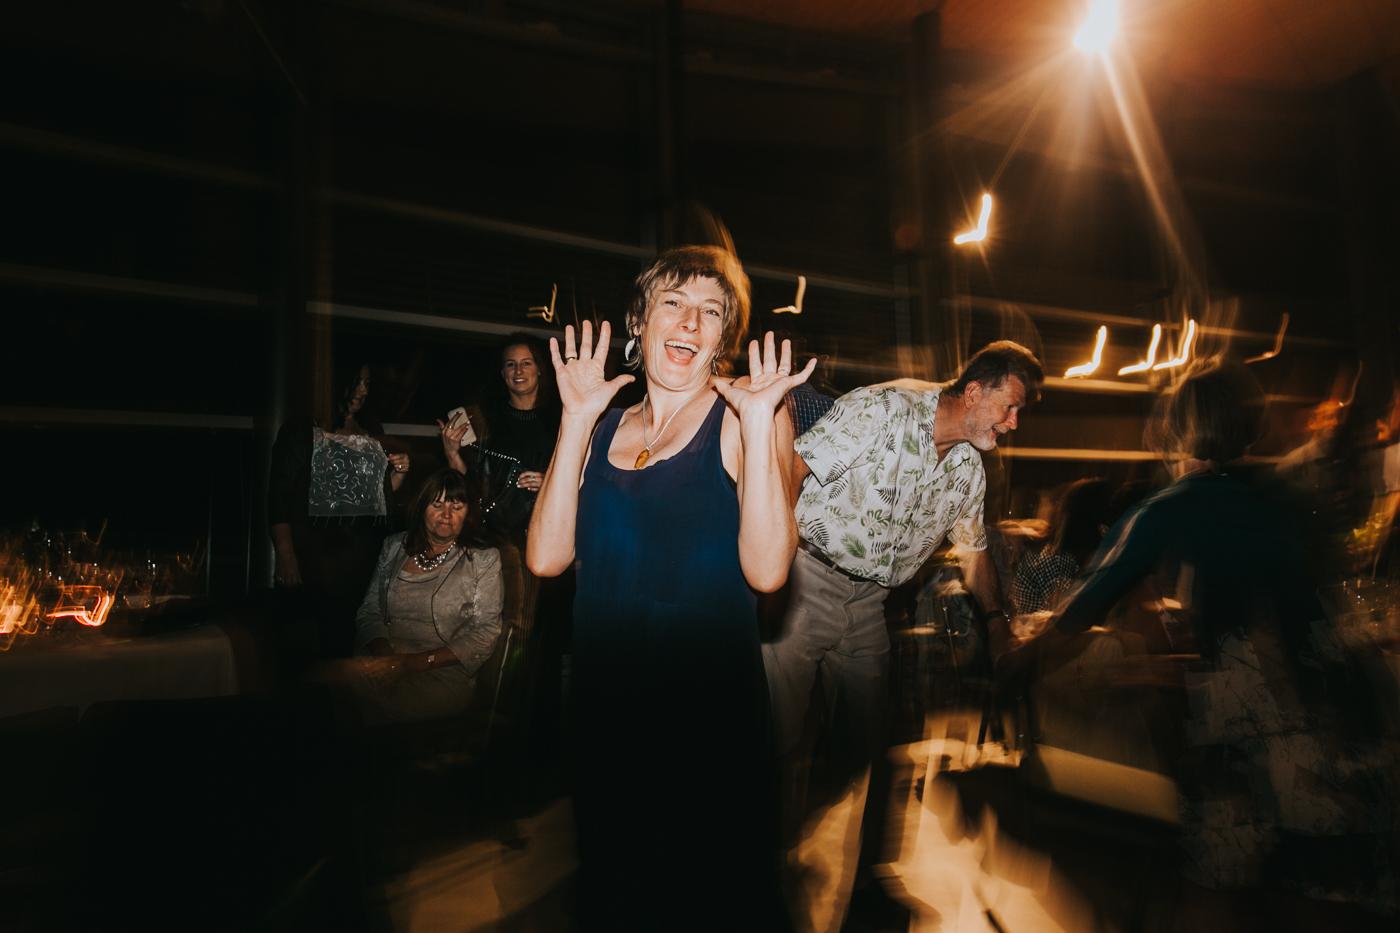 Ariana & Tim - Dunedin, New Zealand Wedding - Destination Wedding - Samantha Heather Photography-289.jpg